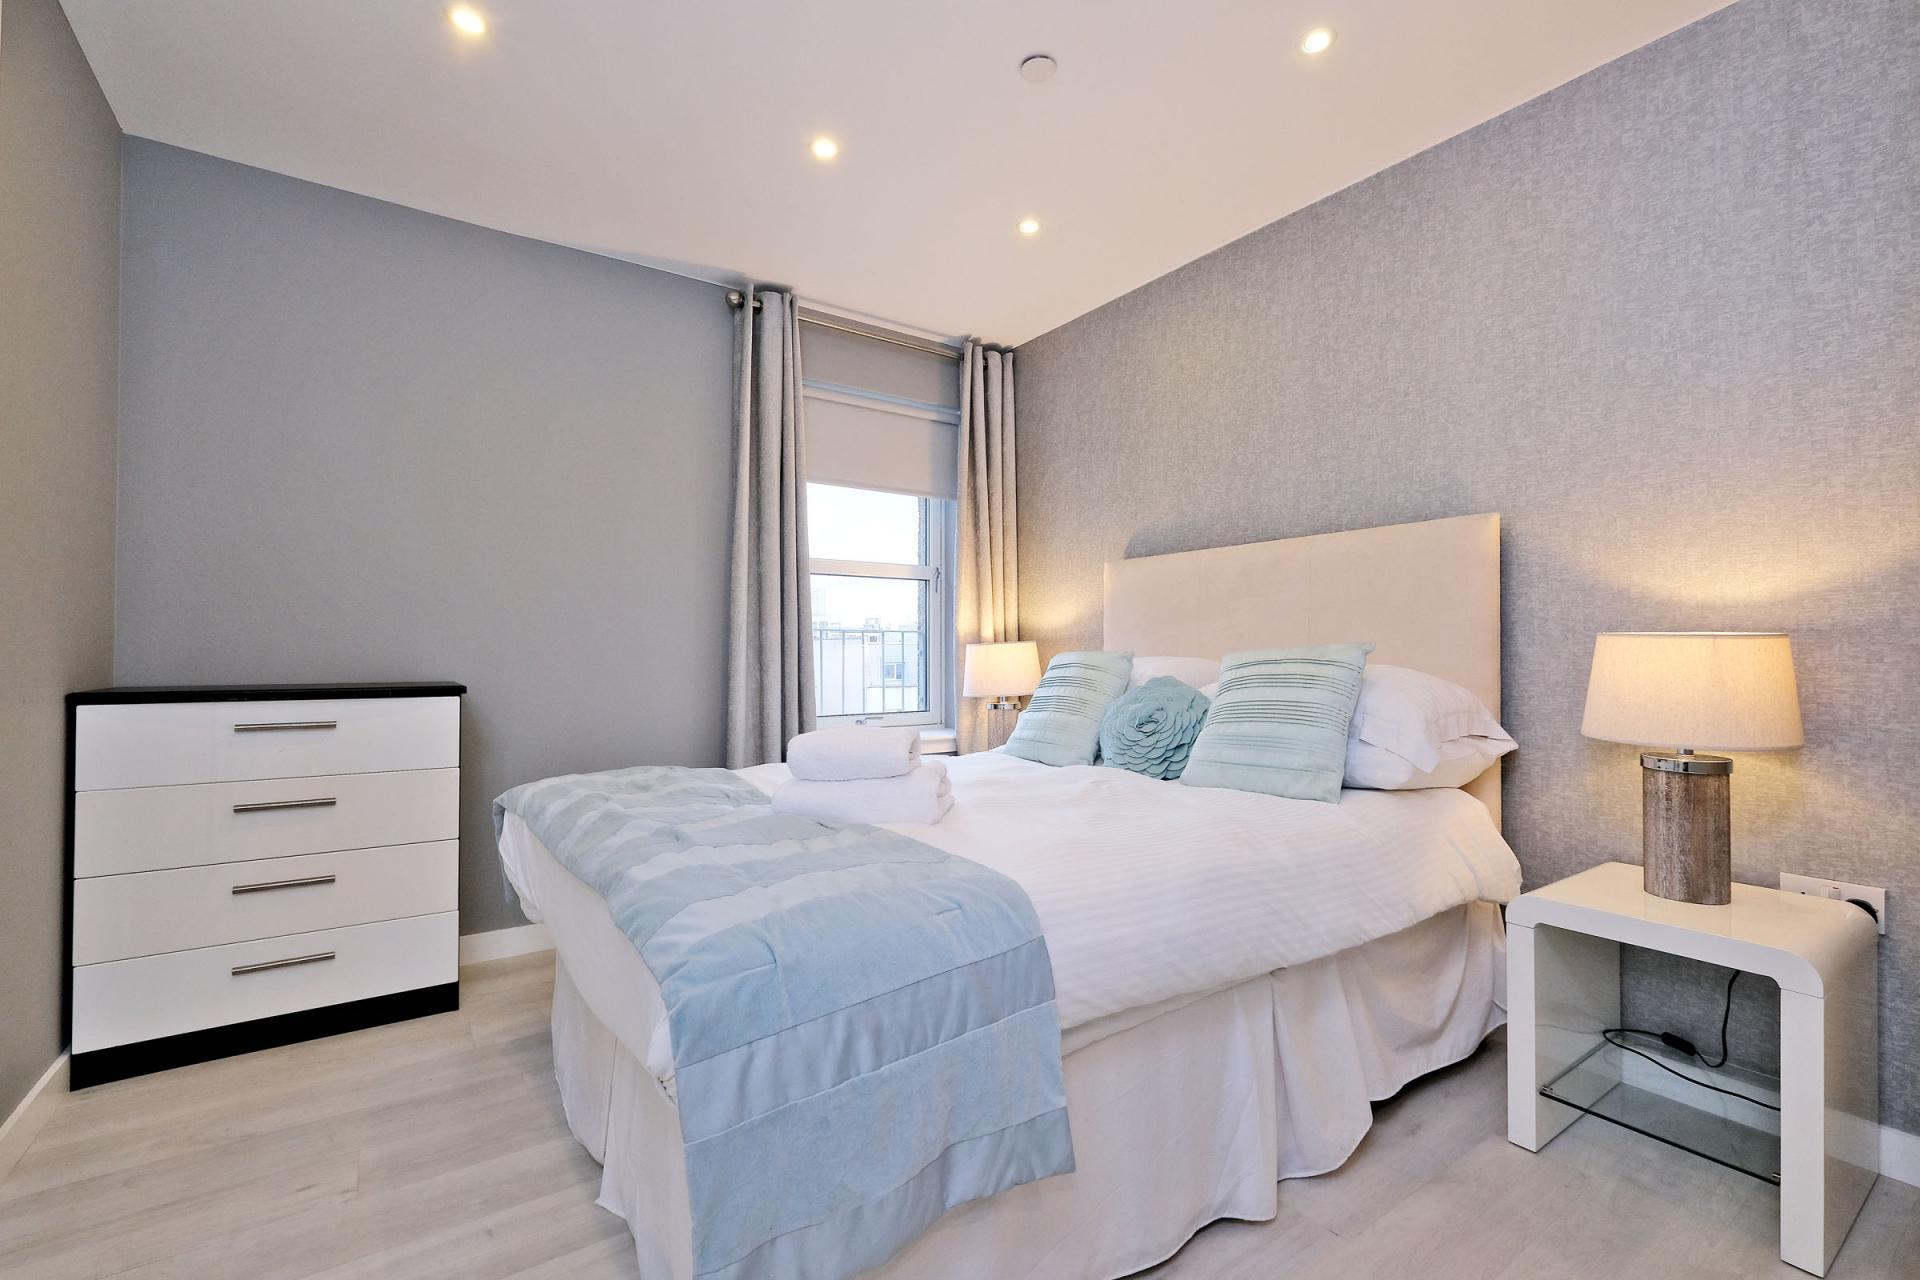 Bedroom at 54 Chapel Street Apartments, Centre, Aberdeen - Citybase Apartments